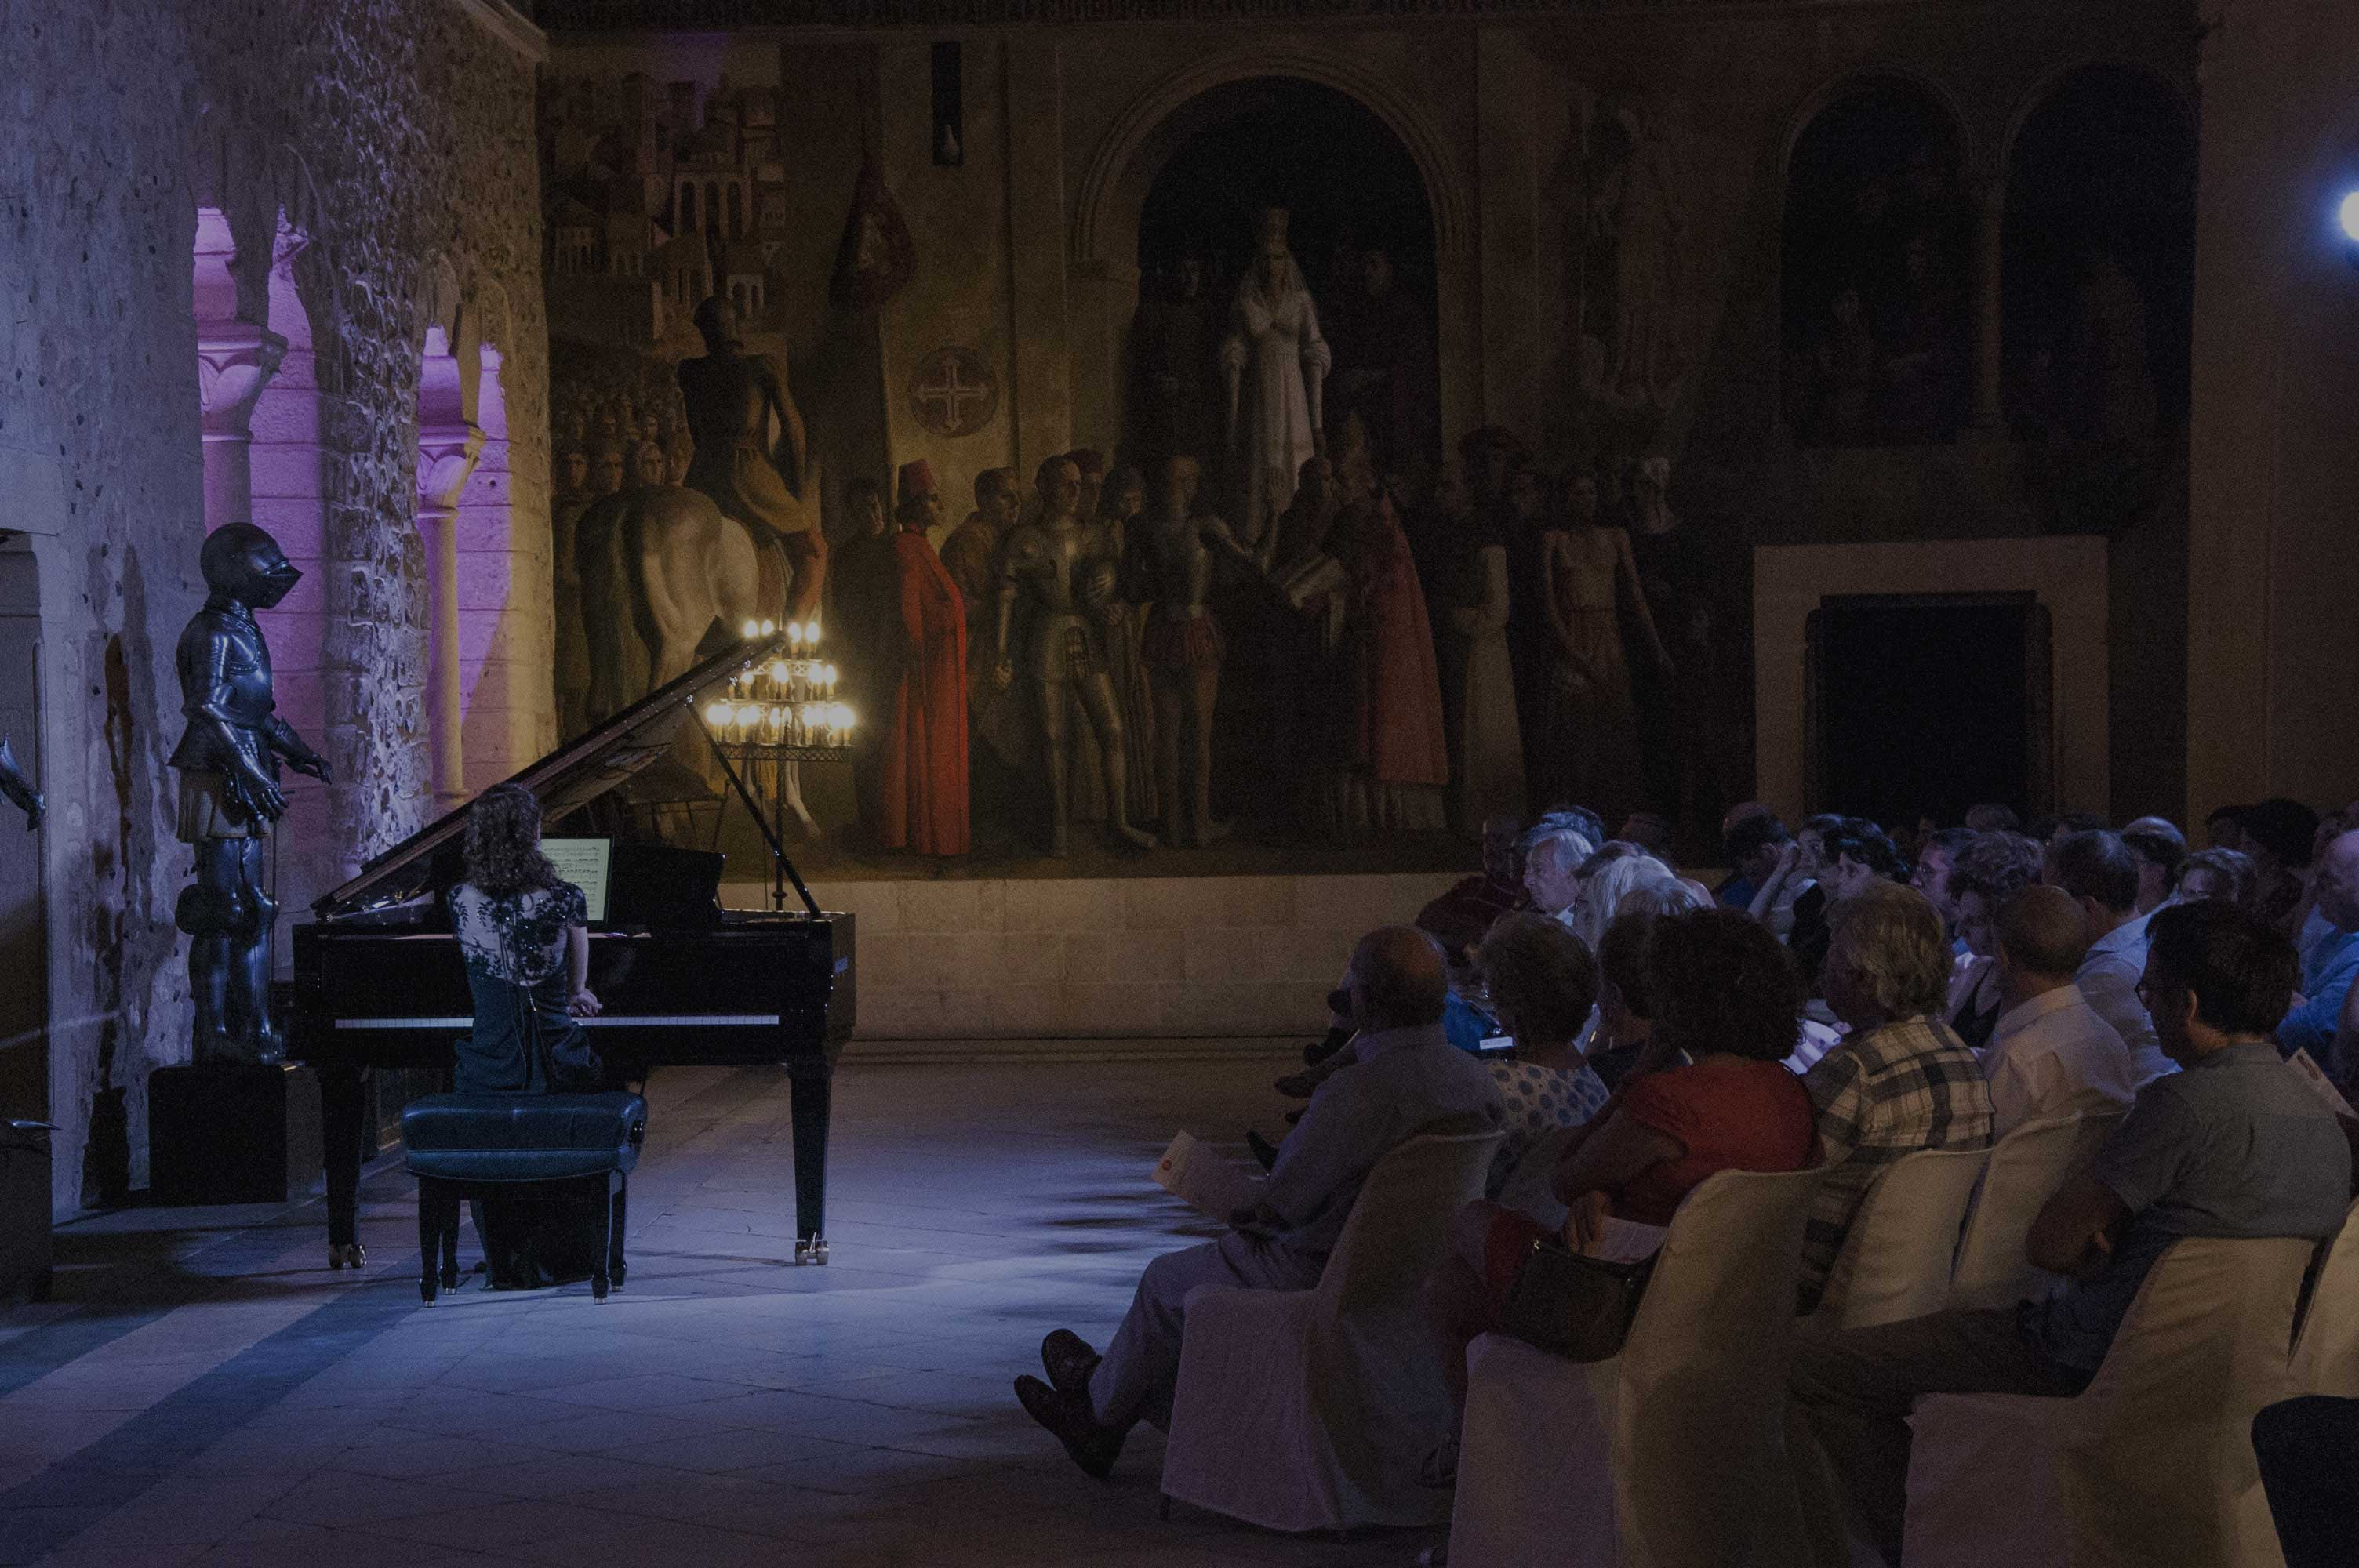 Escenarios del Festival - MUSEG: Festival Musical de Segovia